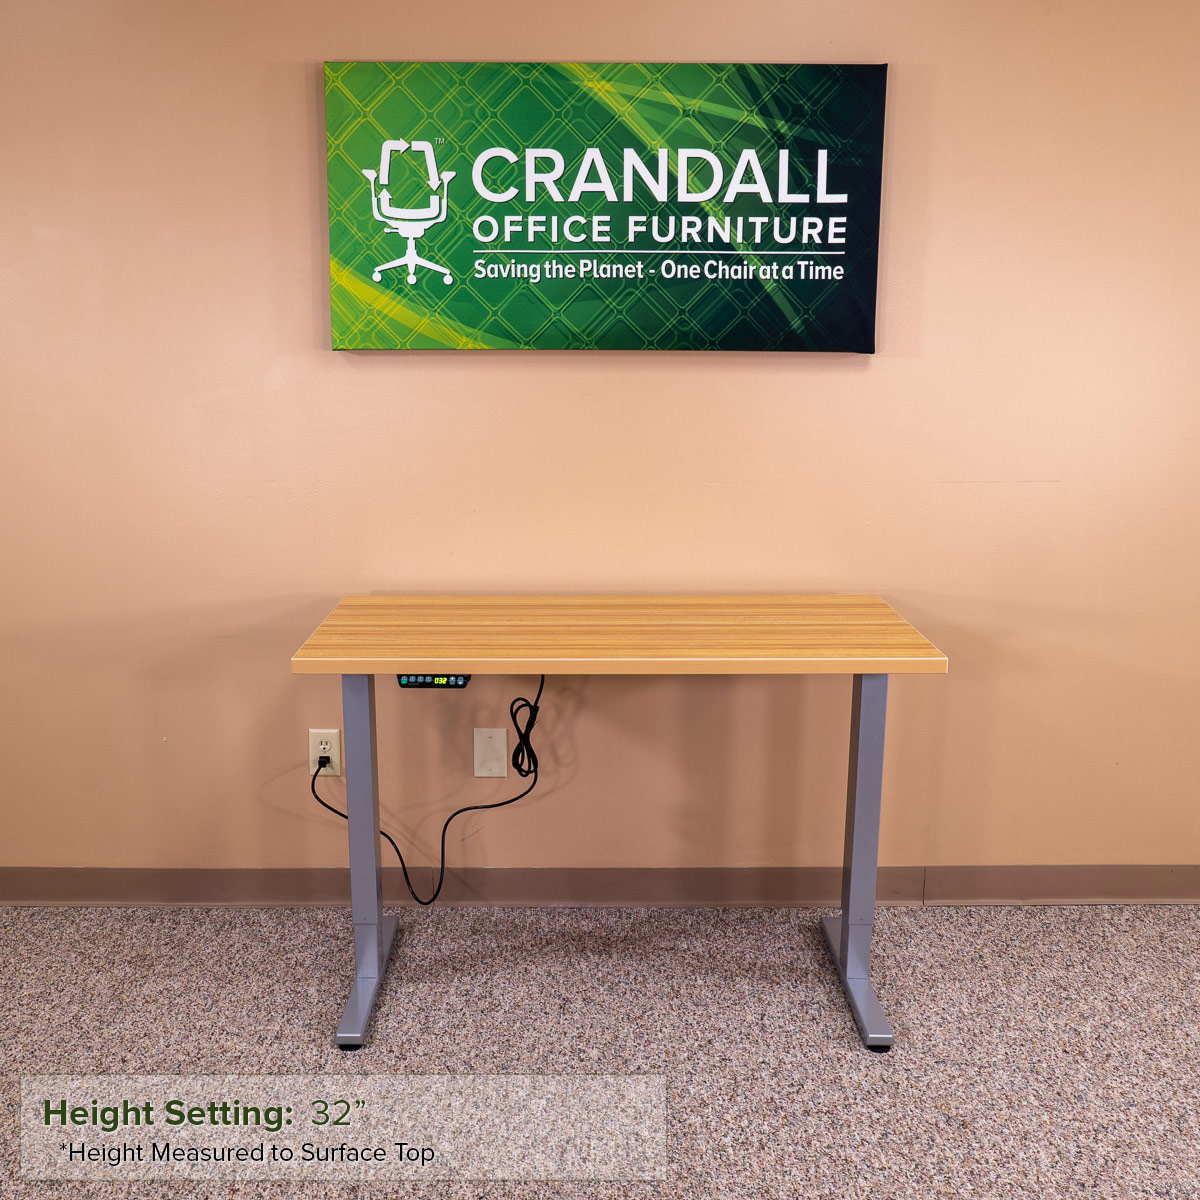 Crandall-Office-Furniture-ErgomatIQ Height-Adjustable-Desk-011